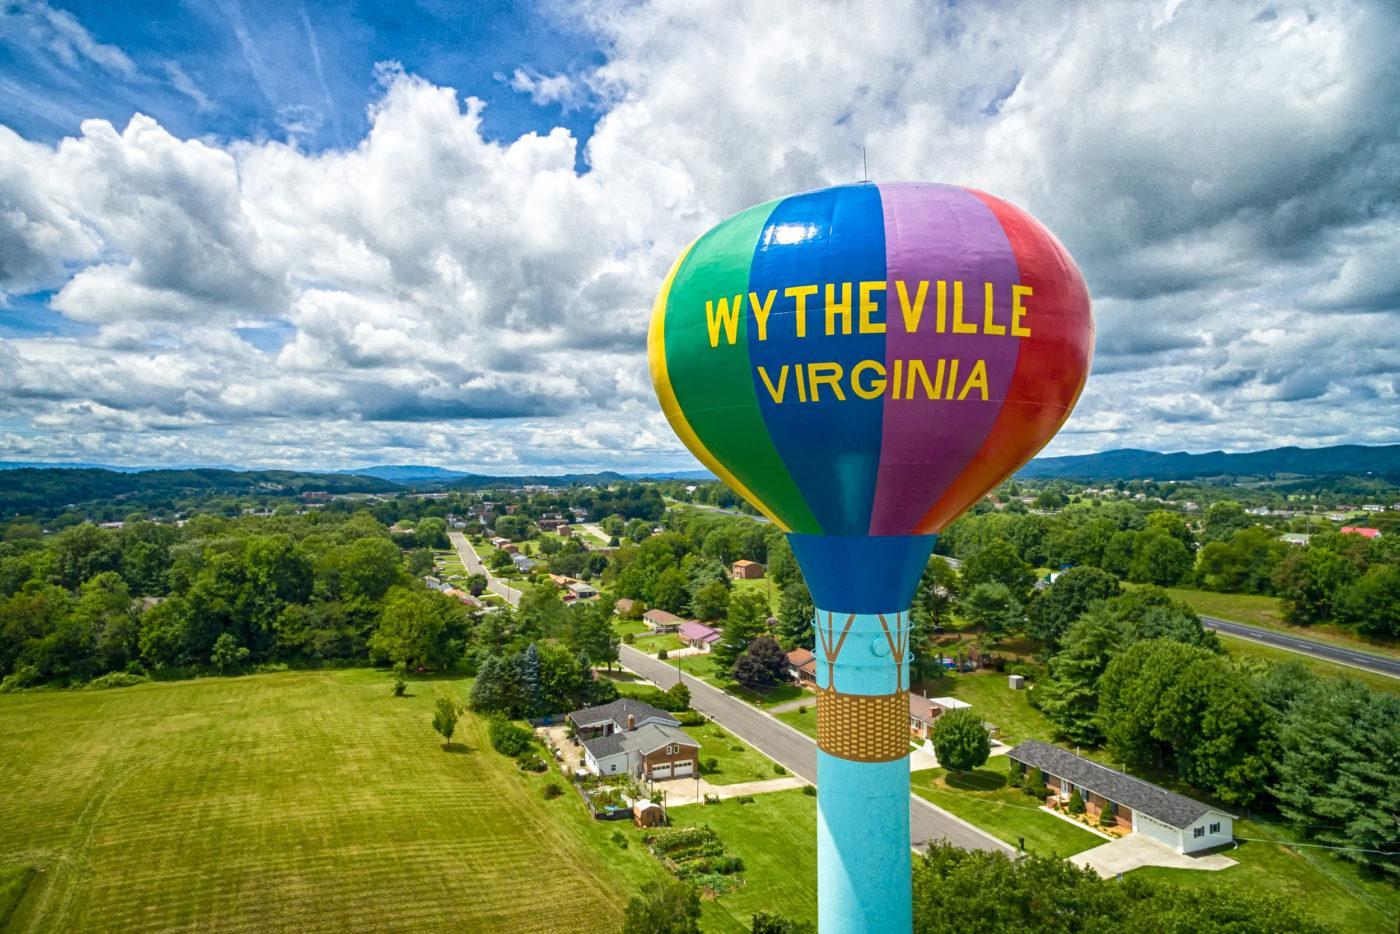 Wythe County